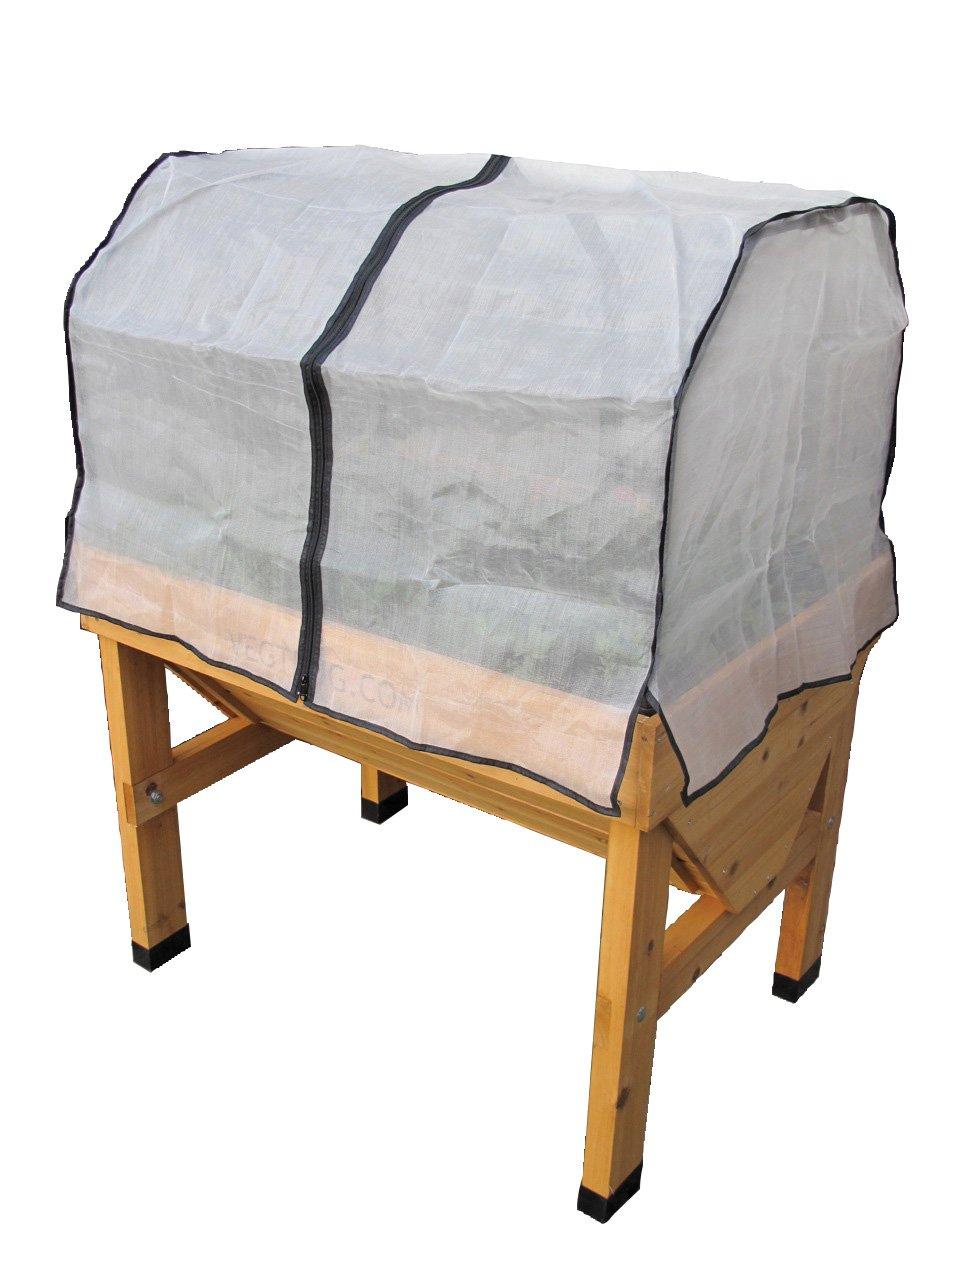 VegTrug Small Wall hugger Greenhouse Micromesh Cover